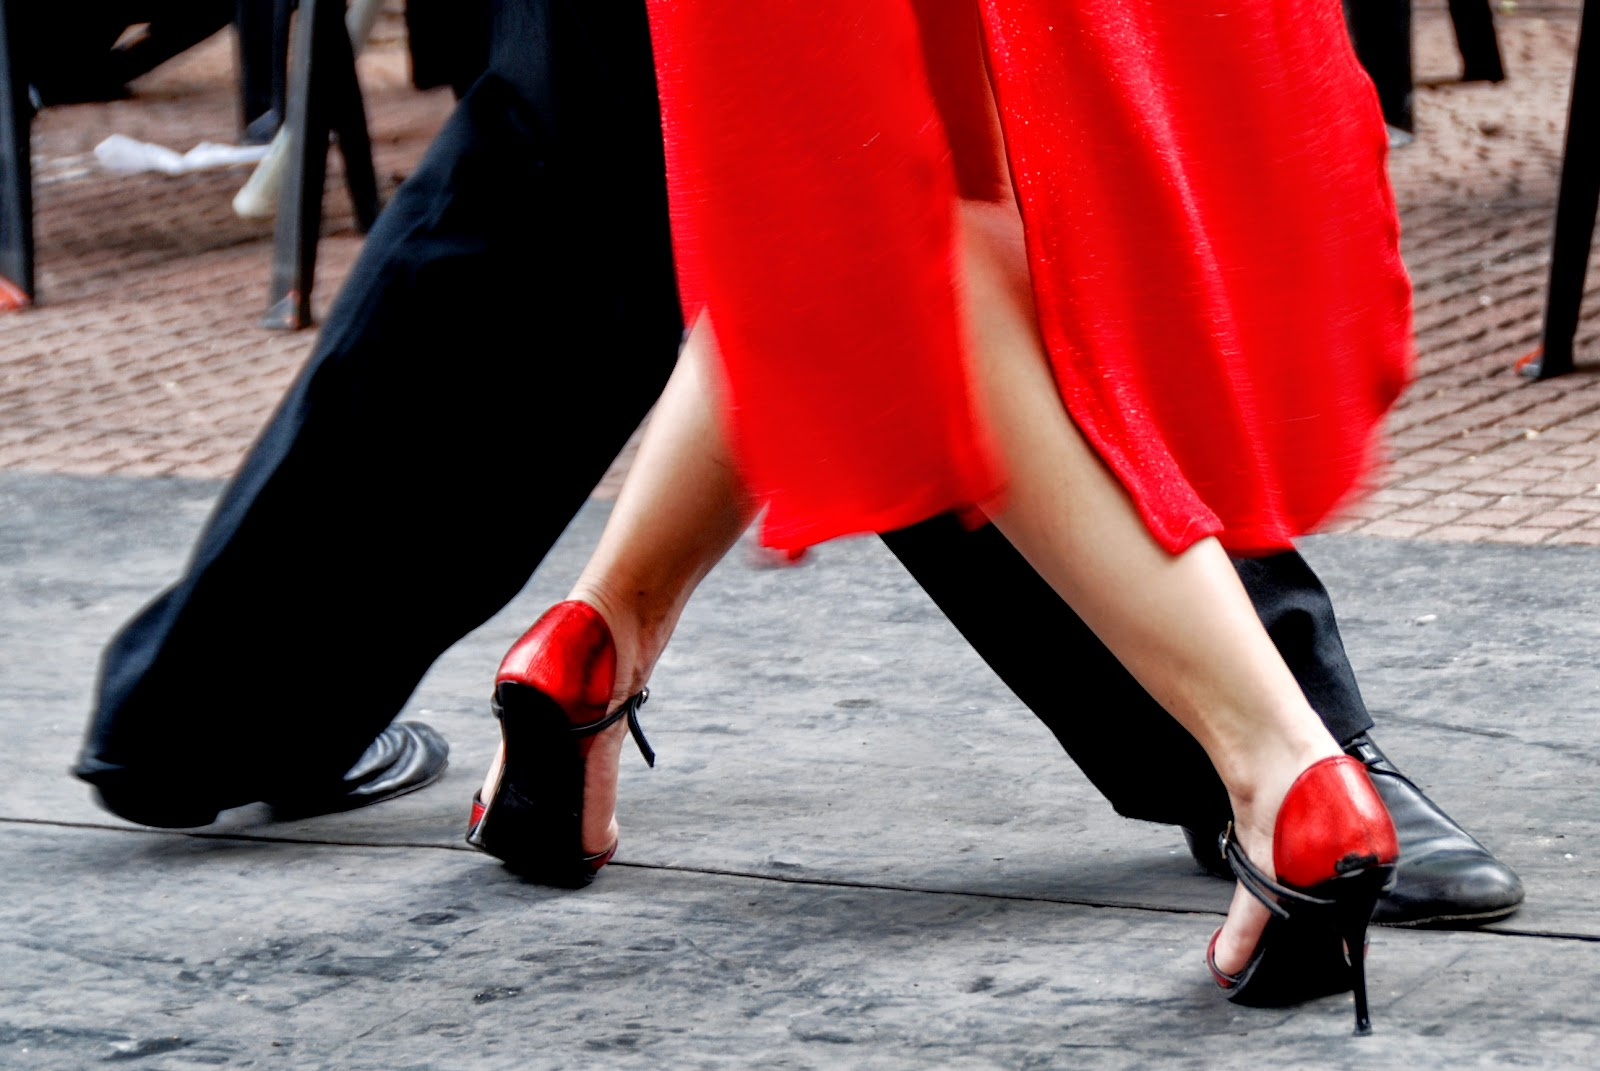 Tango Dance in Streets HD Photos